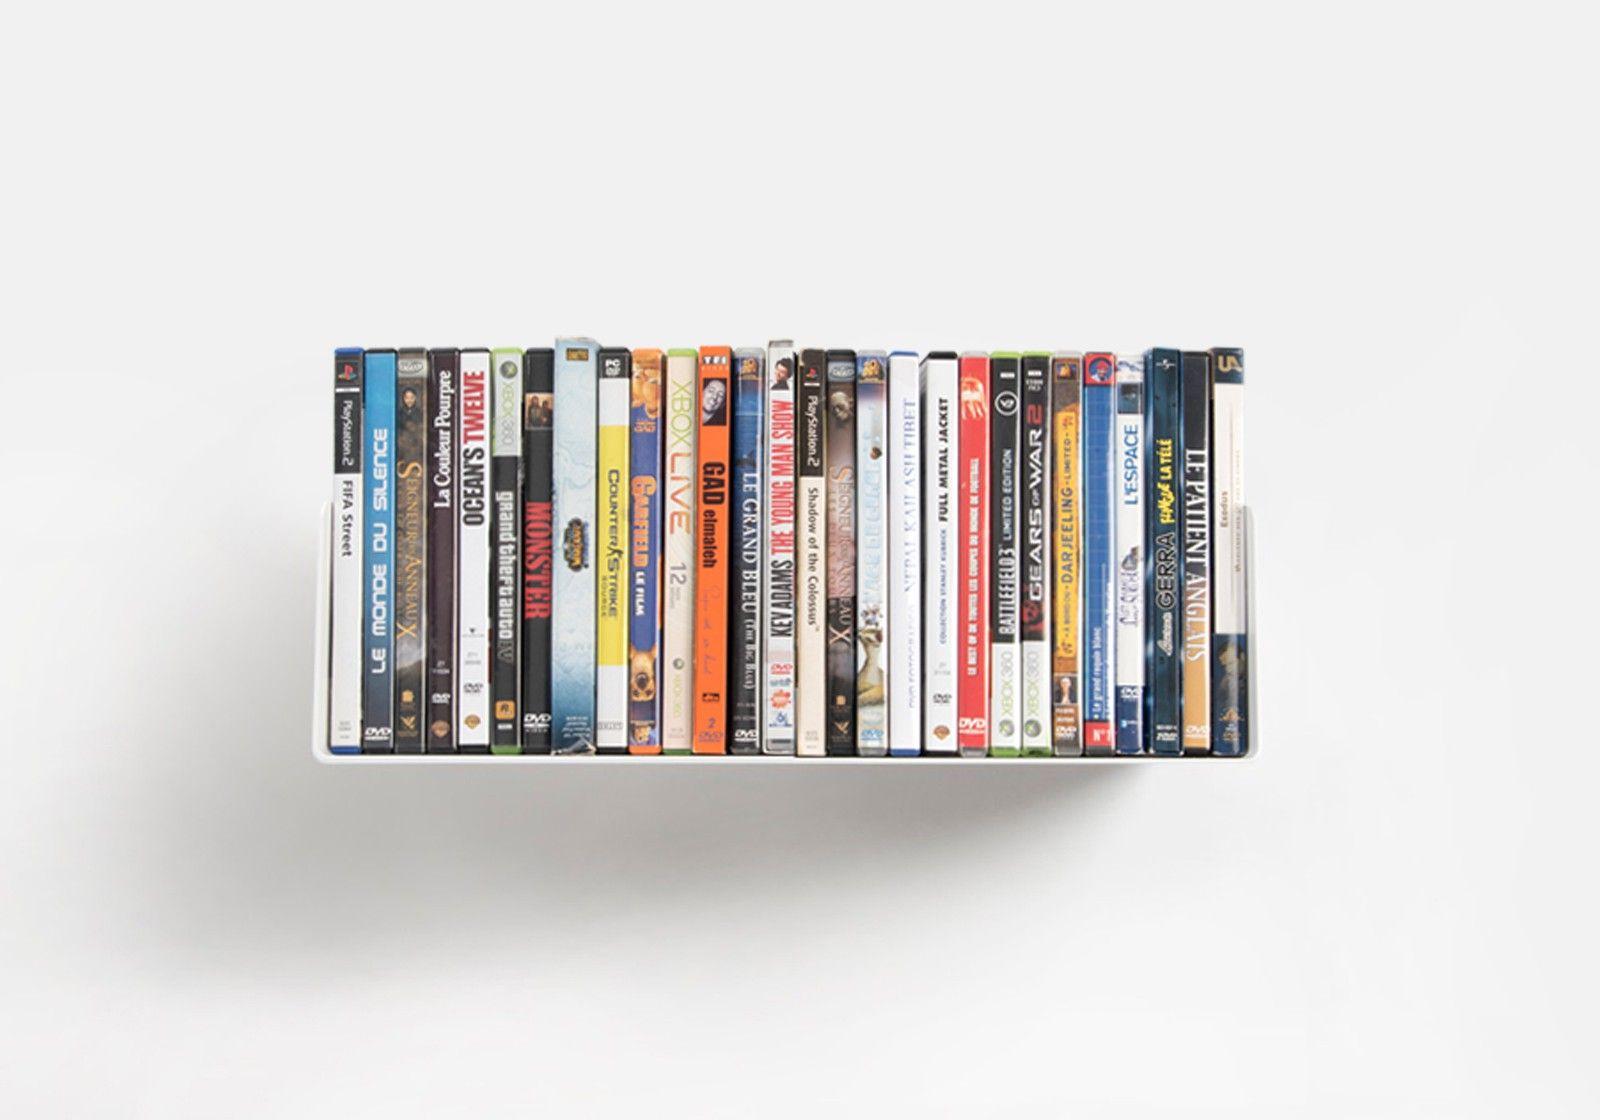 Étagère DVD USDVD - étagère range DVD 45 cm - TEEbooks